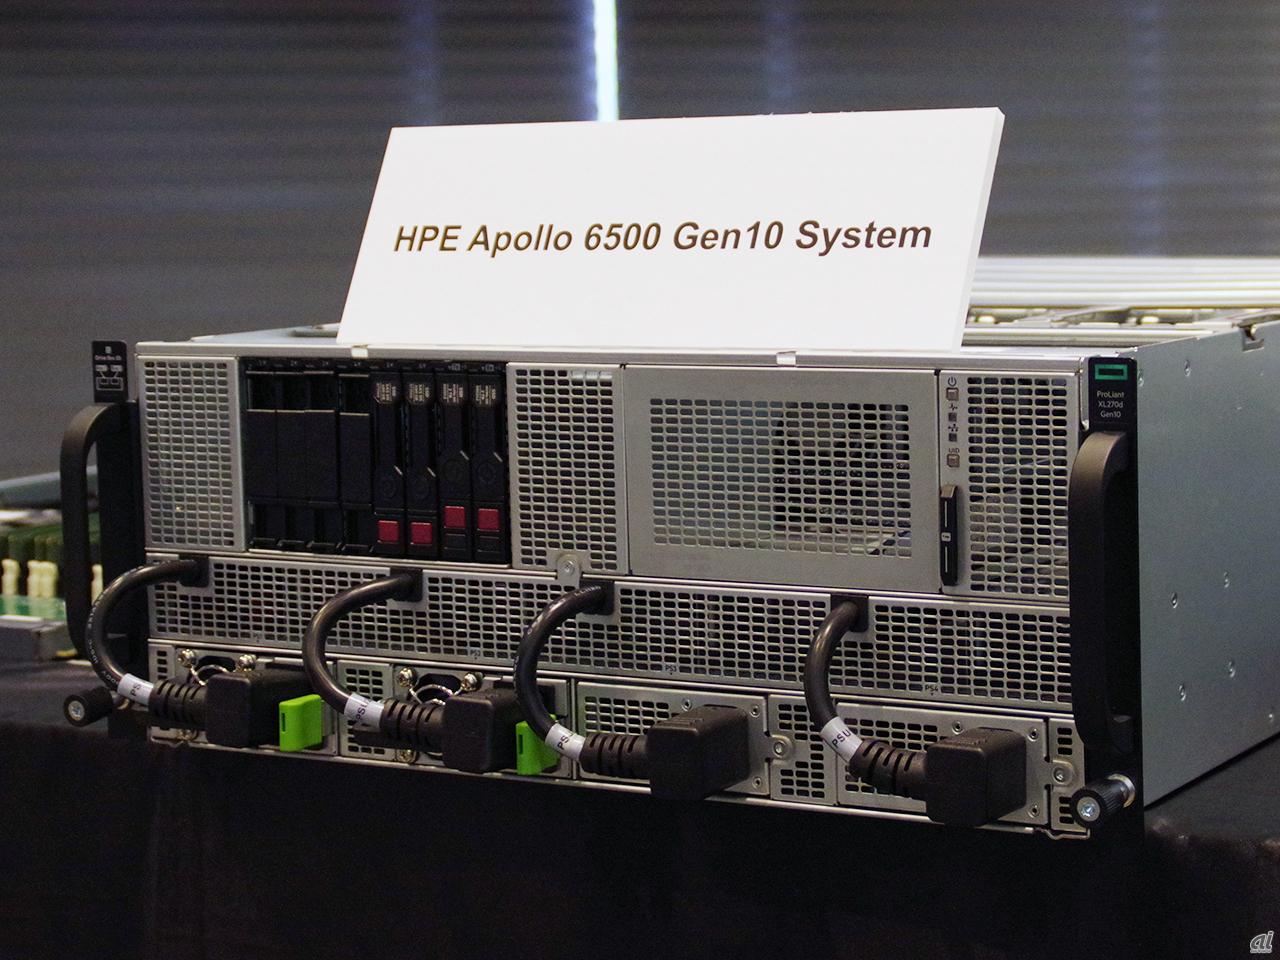 hpe gpu特化型サーバ apollo 6500 gen10 を発表 企業のai活用を支援